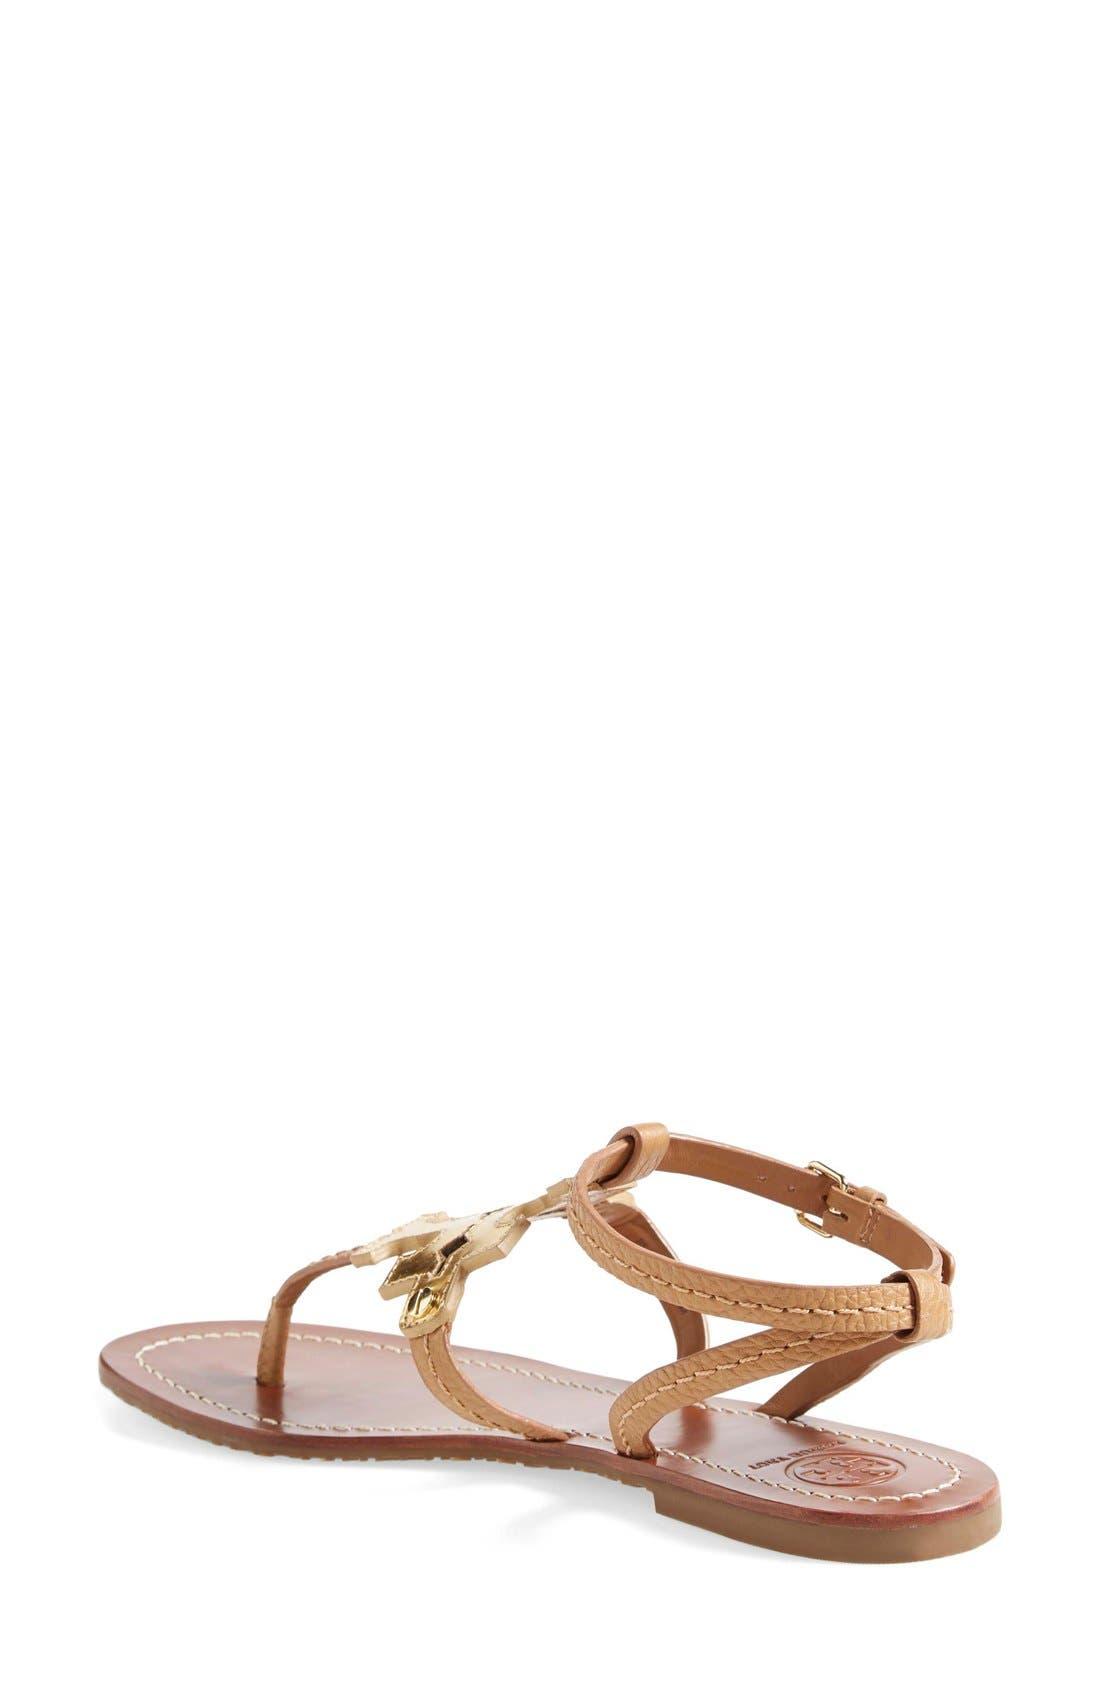 Alternate Image 2  - Tory Burch 'Chandler' Leather Sandal (Women)